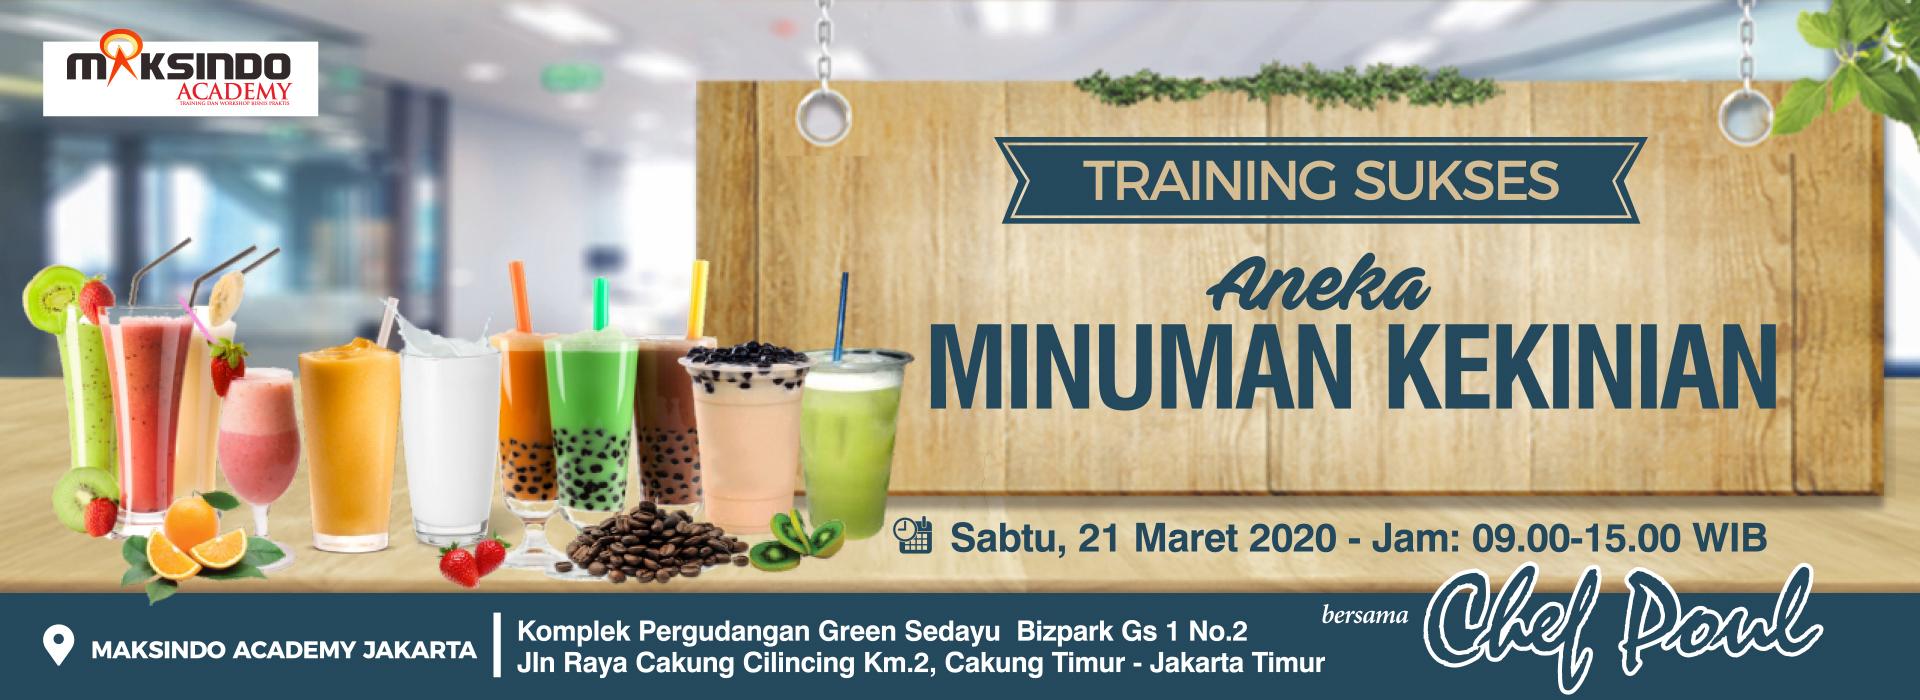 Toko Mesin Maksindo Semarang 4